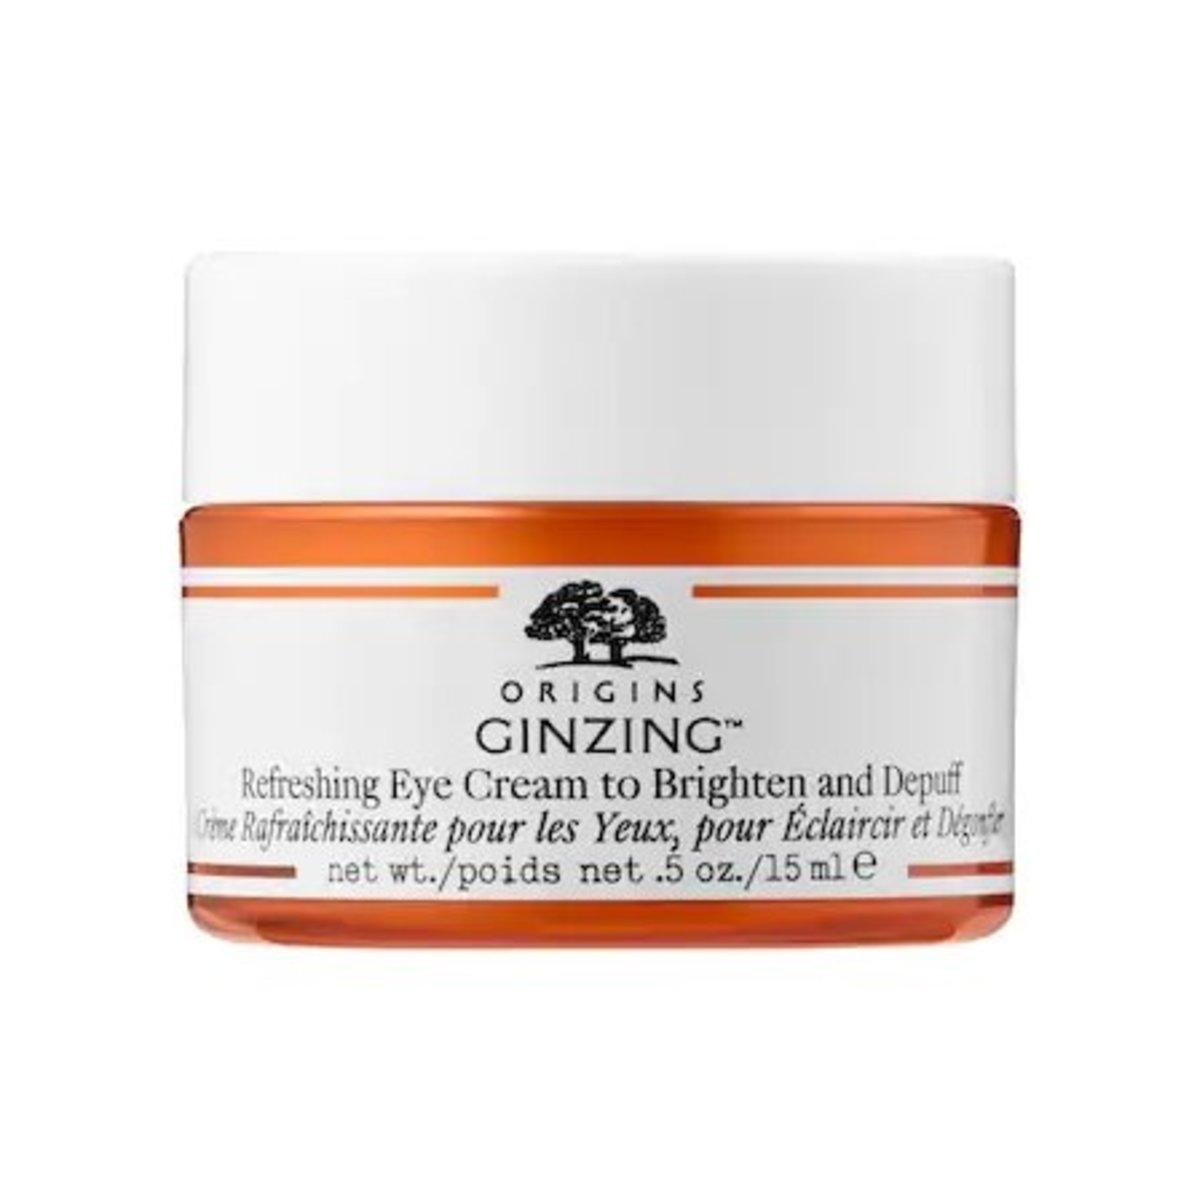 Refreshing Eye Cream To Brighten And Depuff 15ml (Parallel Import)